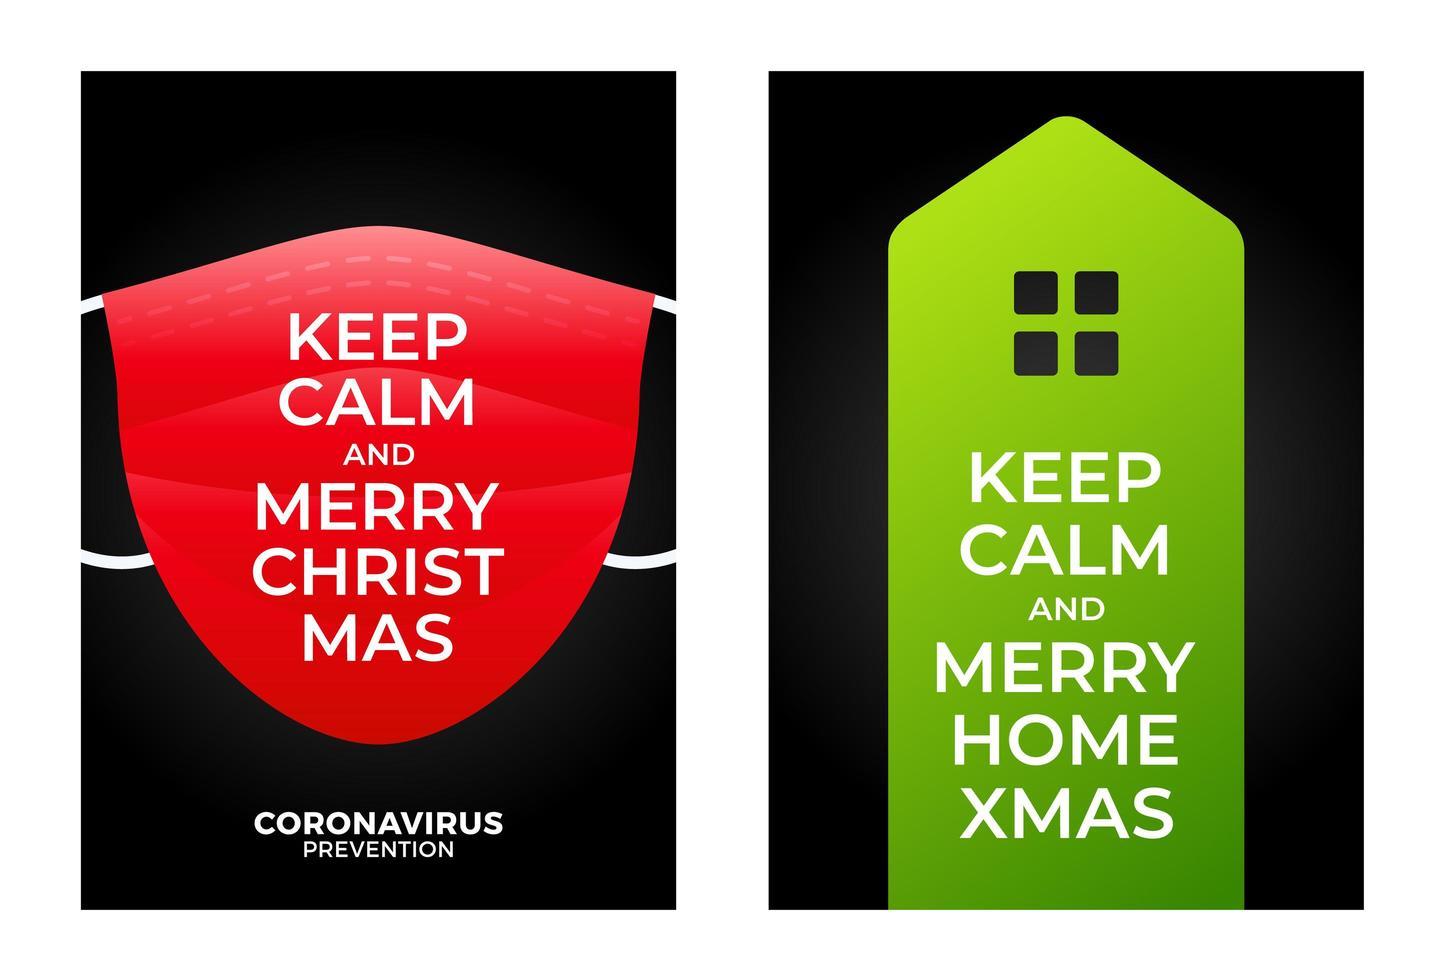 hålla lugnet god jul jul banner koncept vektor